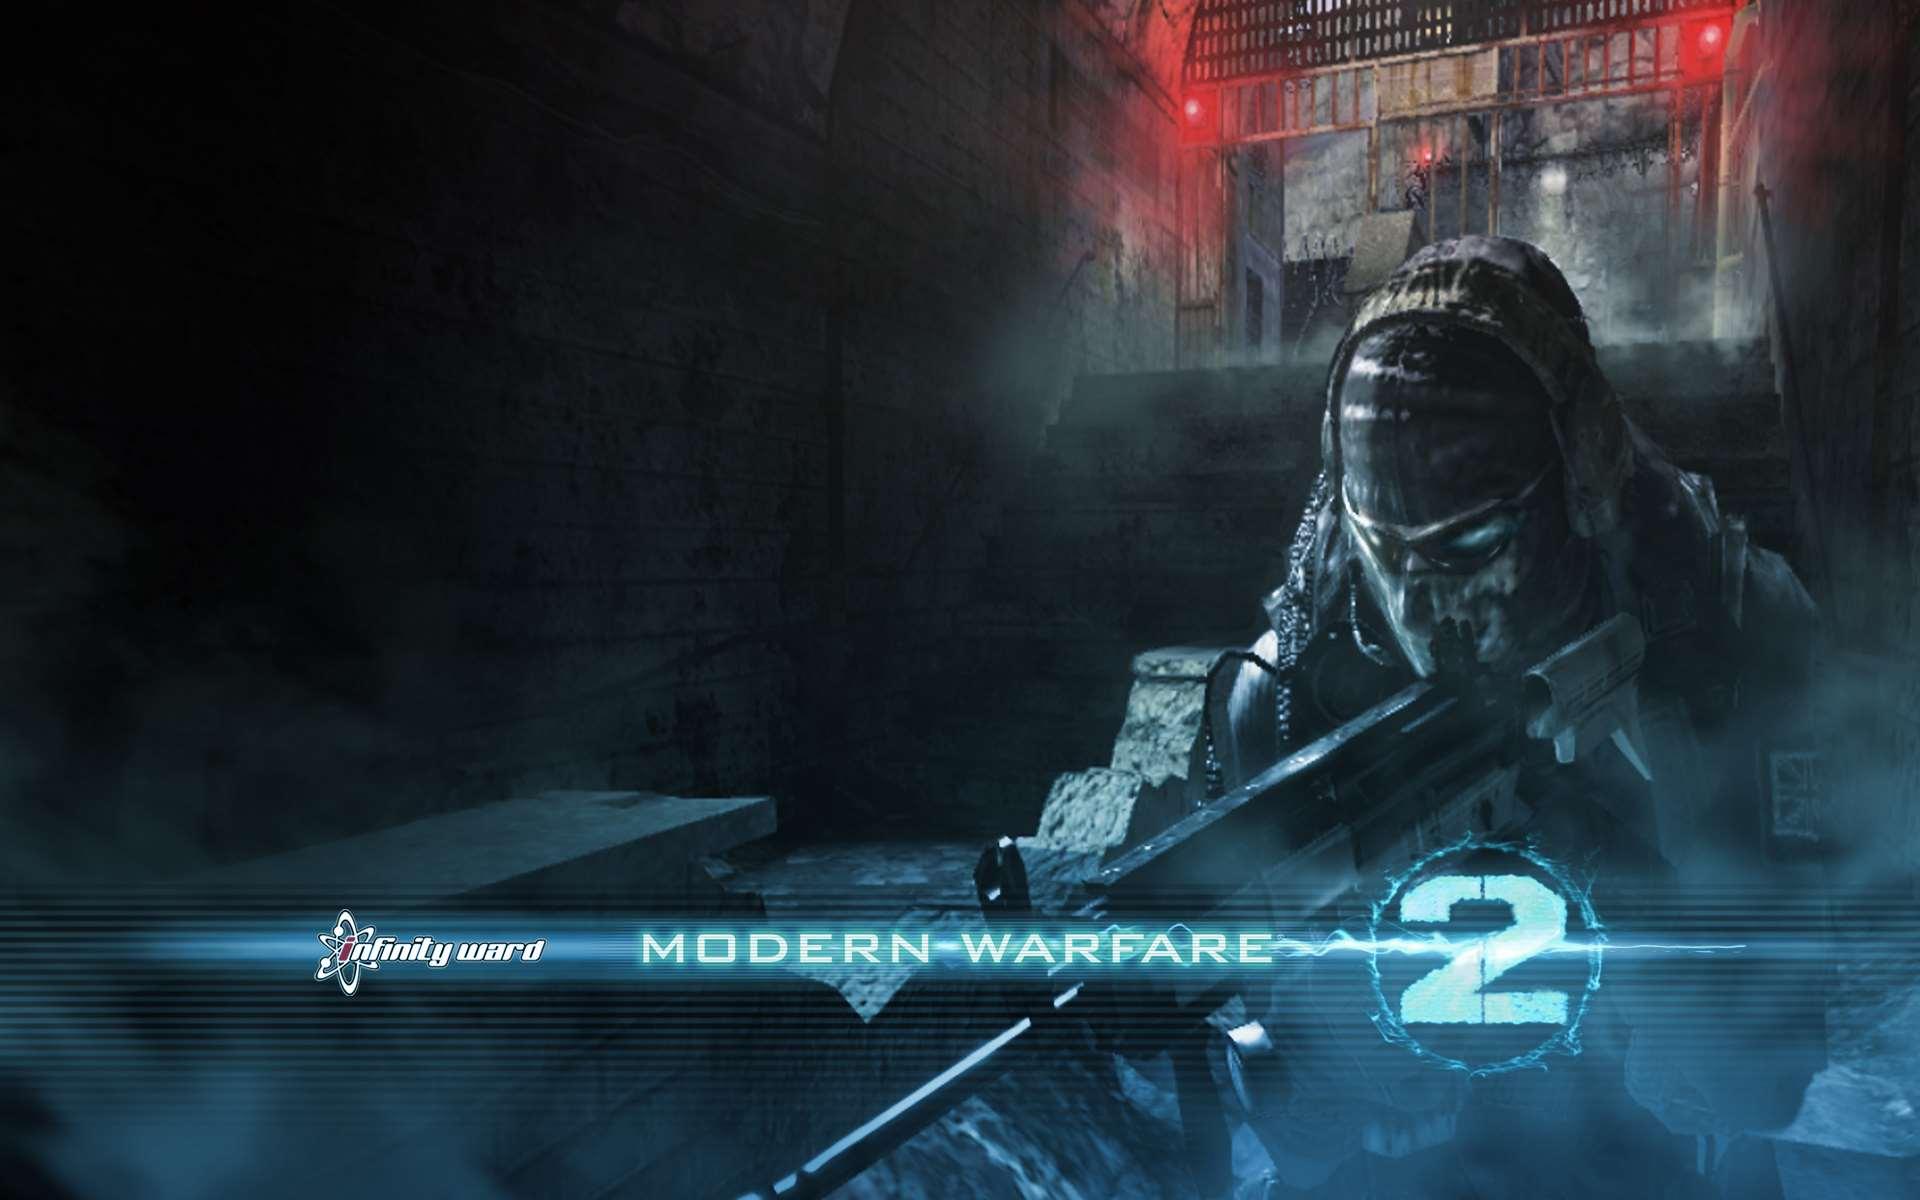 Call Of Duty Modern Warfare 2 Official Call Of Duty Modern